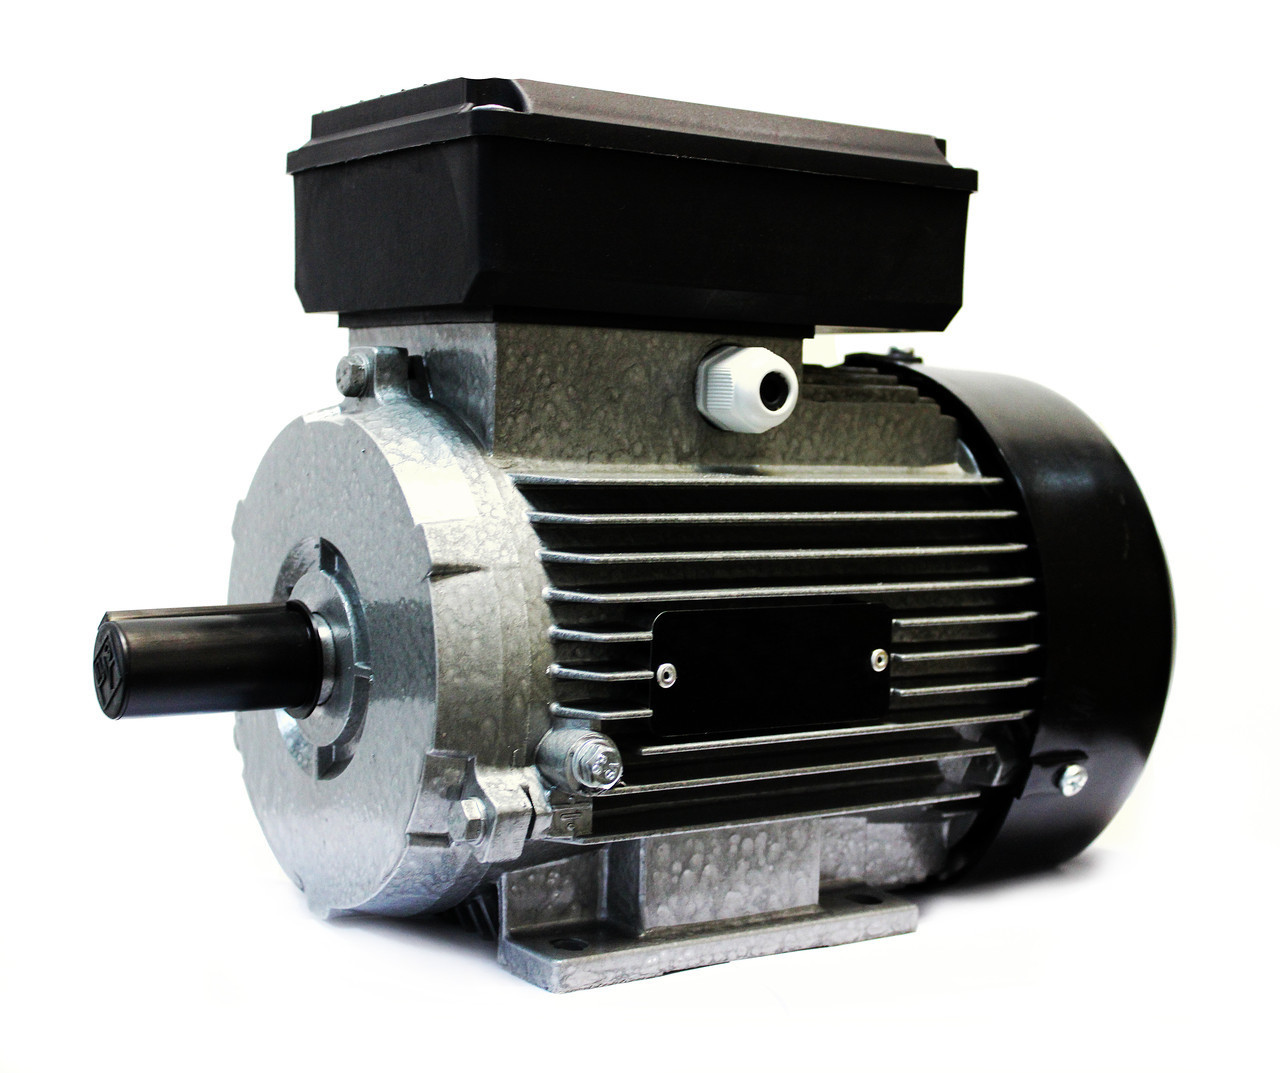 Асинхронный однофазный электродвигатель АИ1Е 80 А2 У2(Л)